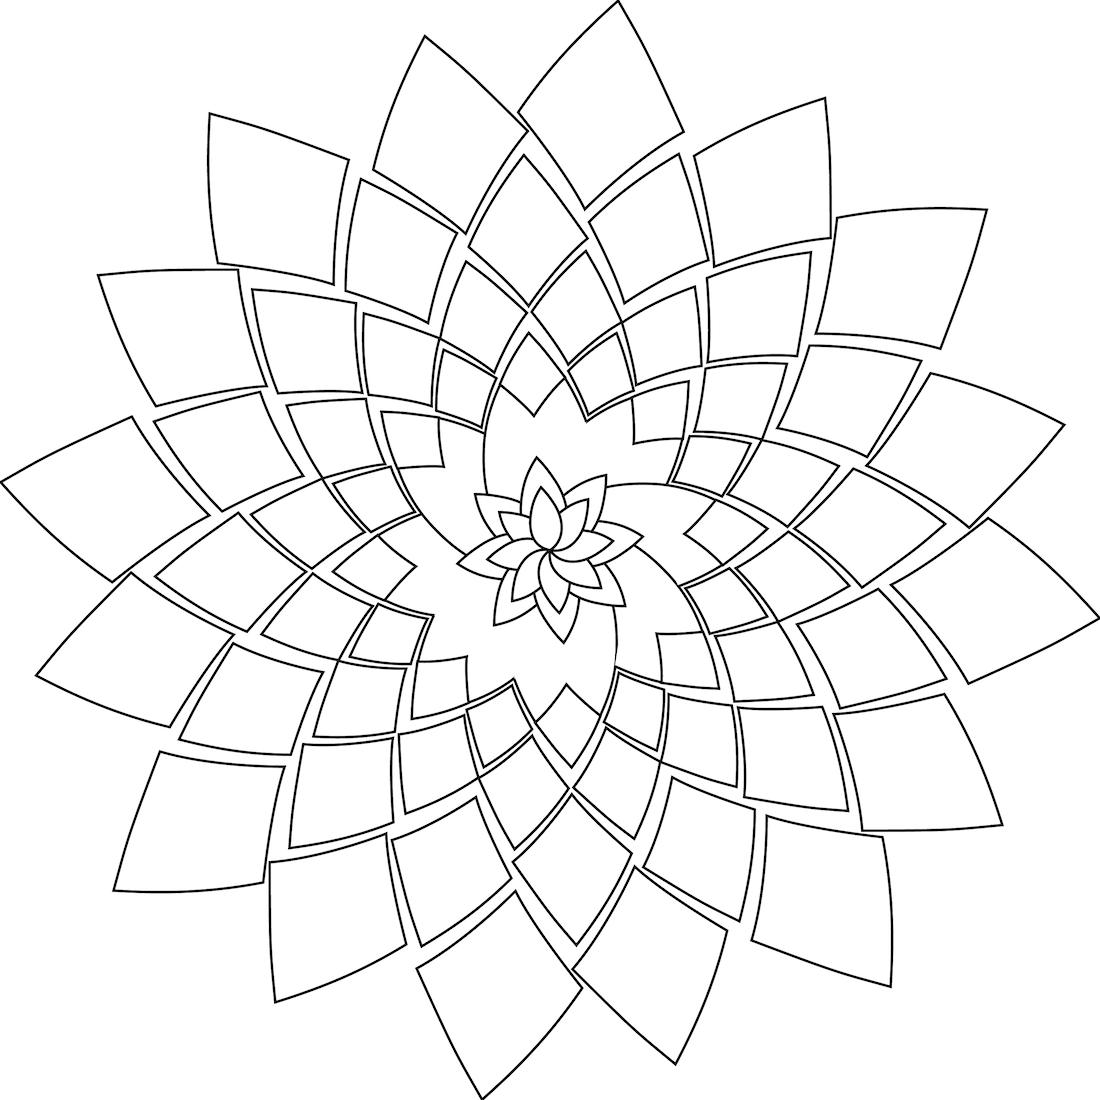 Coloring Page Picture Rosette Soul Picture Of Rosette Soul Coloring Page Geometrische Zeichnung Mandala Zum Ausdrucken Ausmalbilder